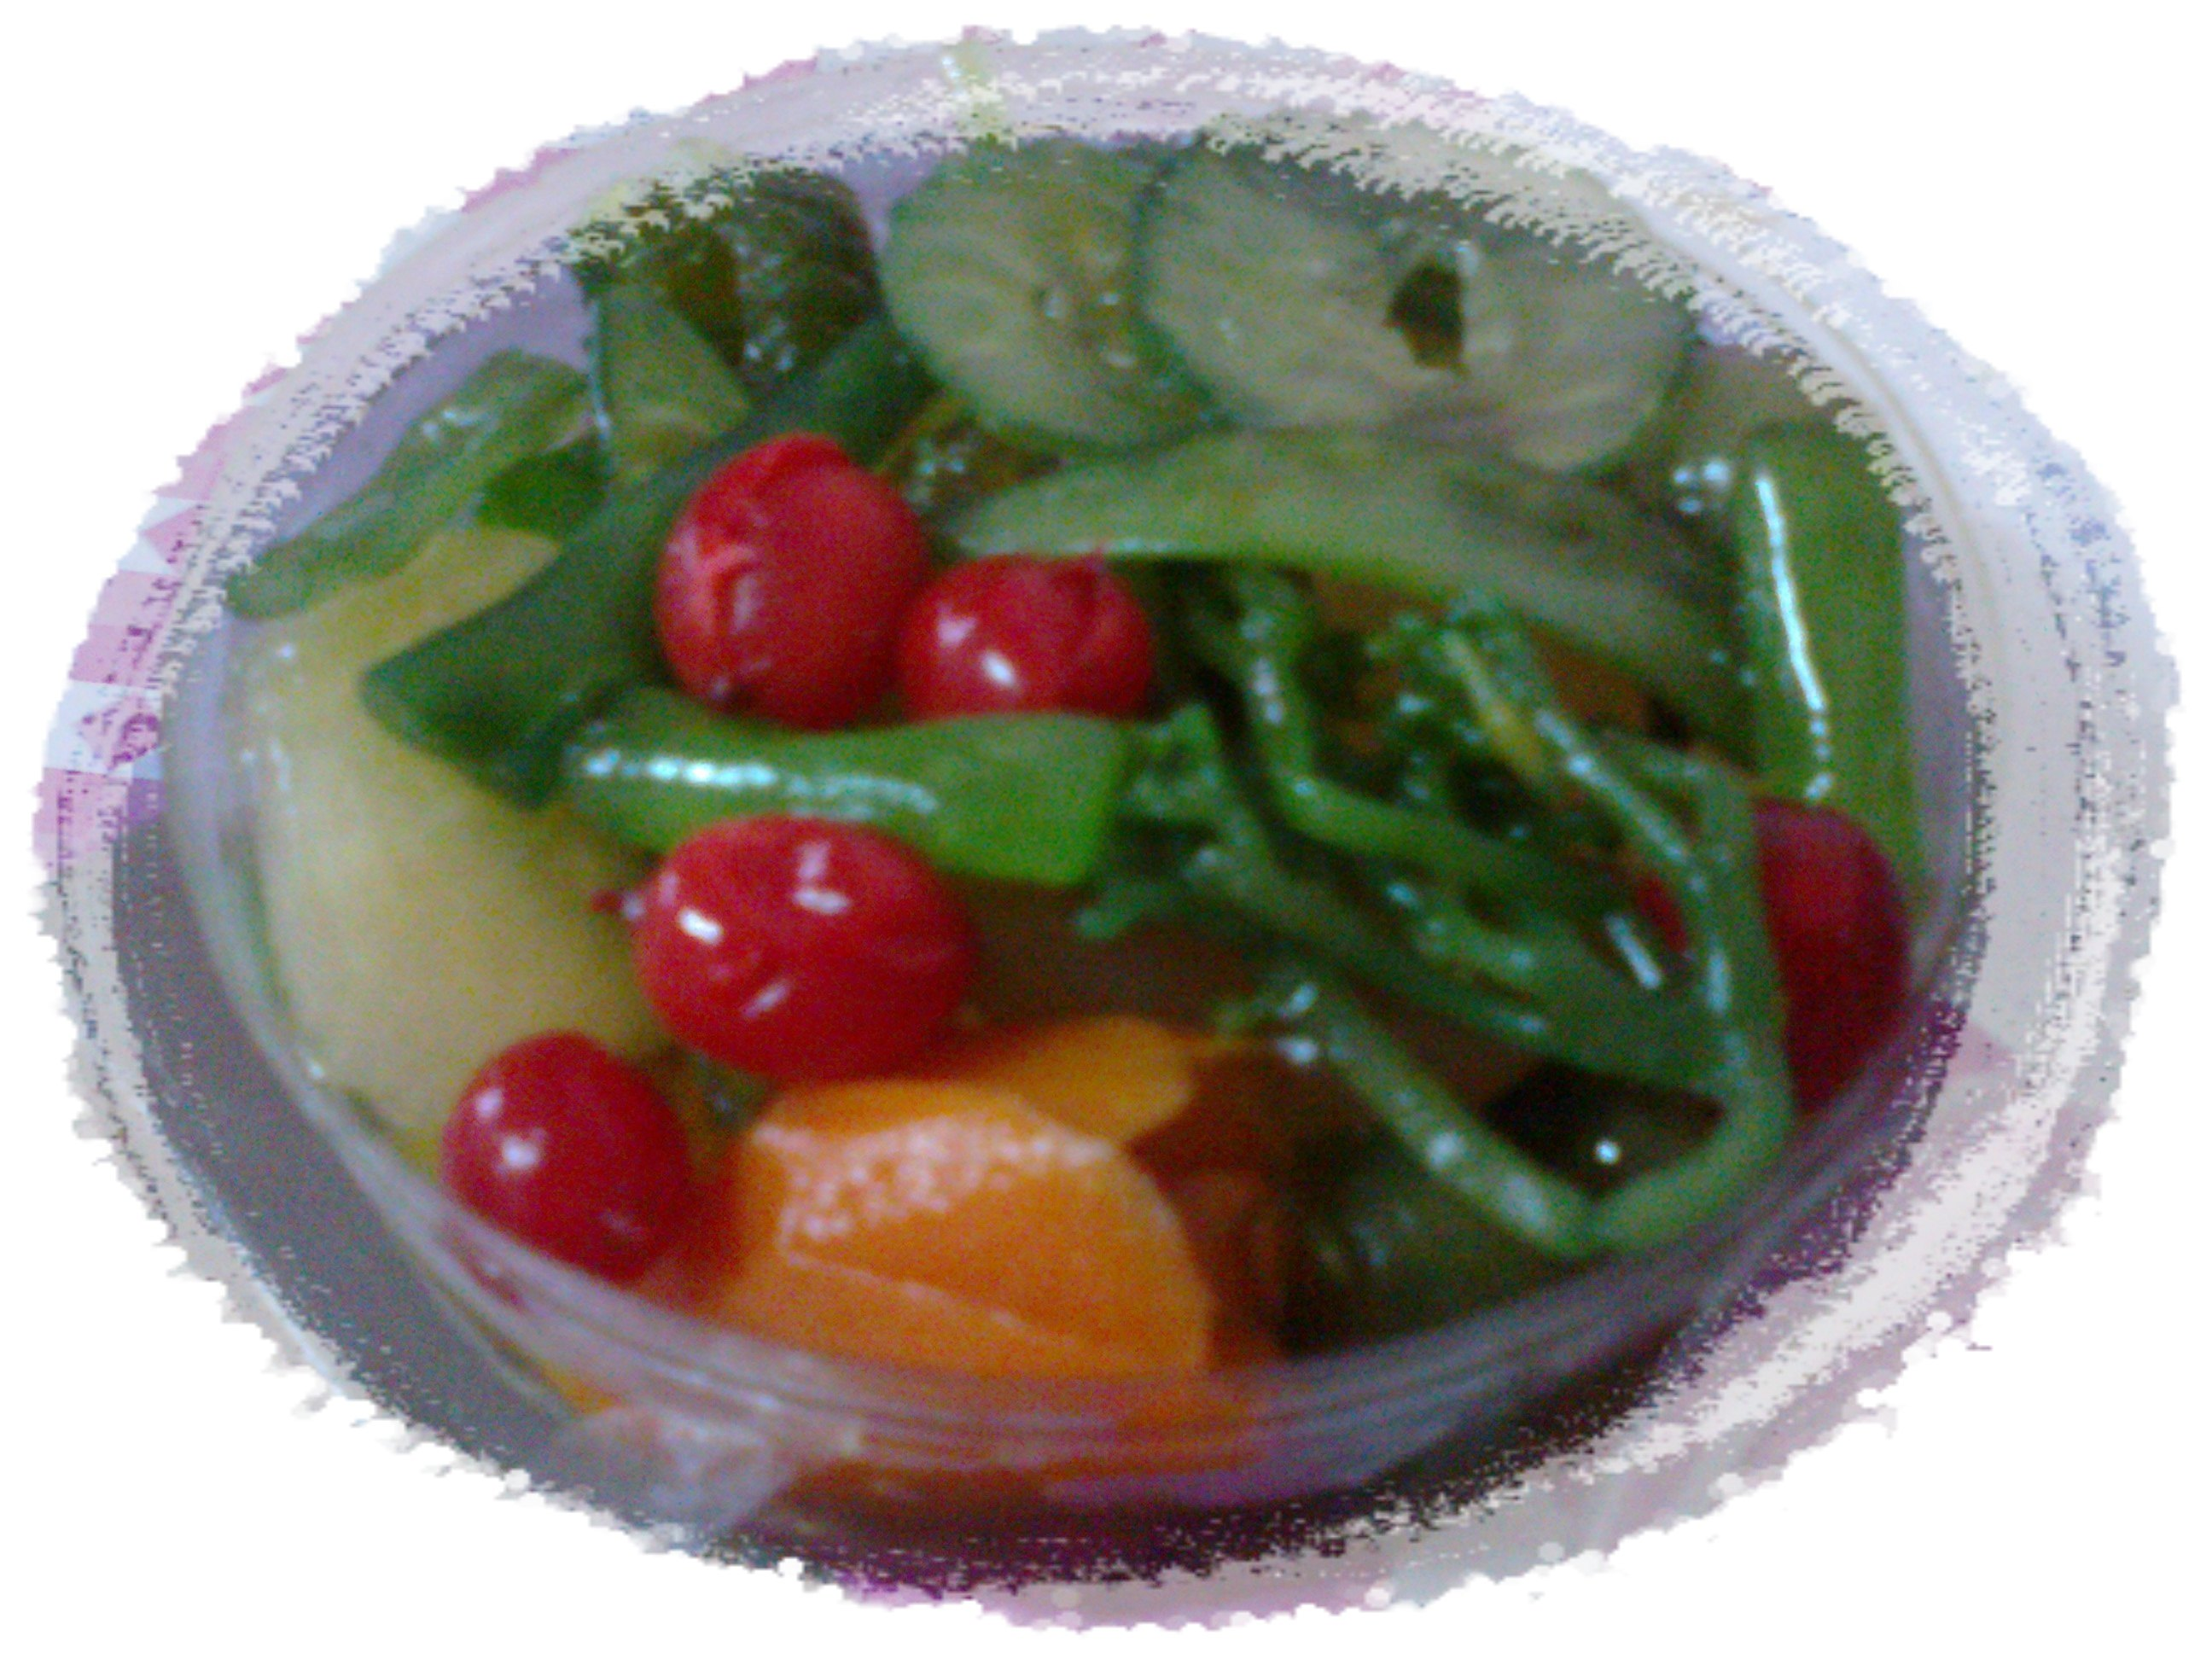 halua langkat manisan manisan halua manisan sayuran medan stabat